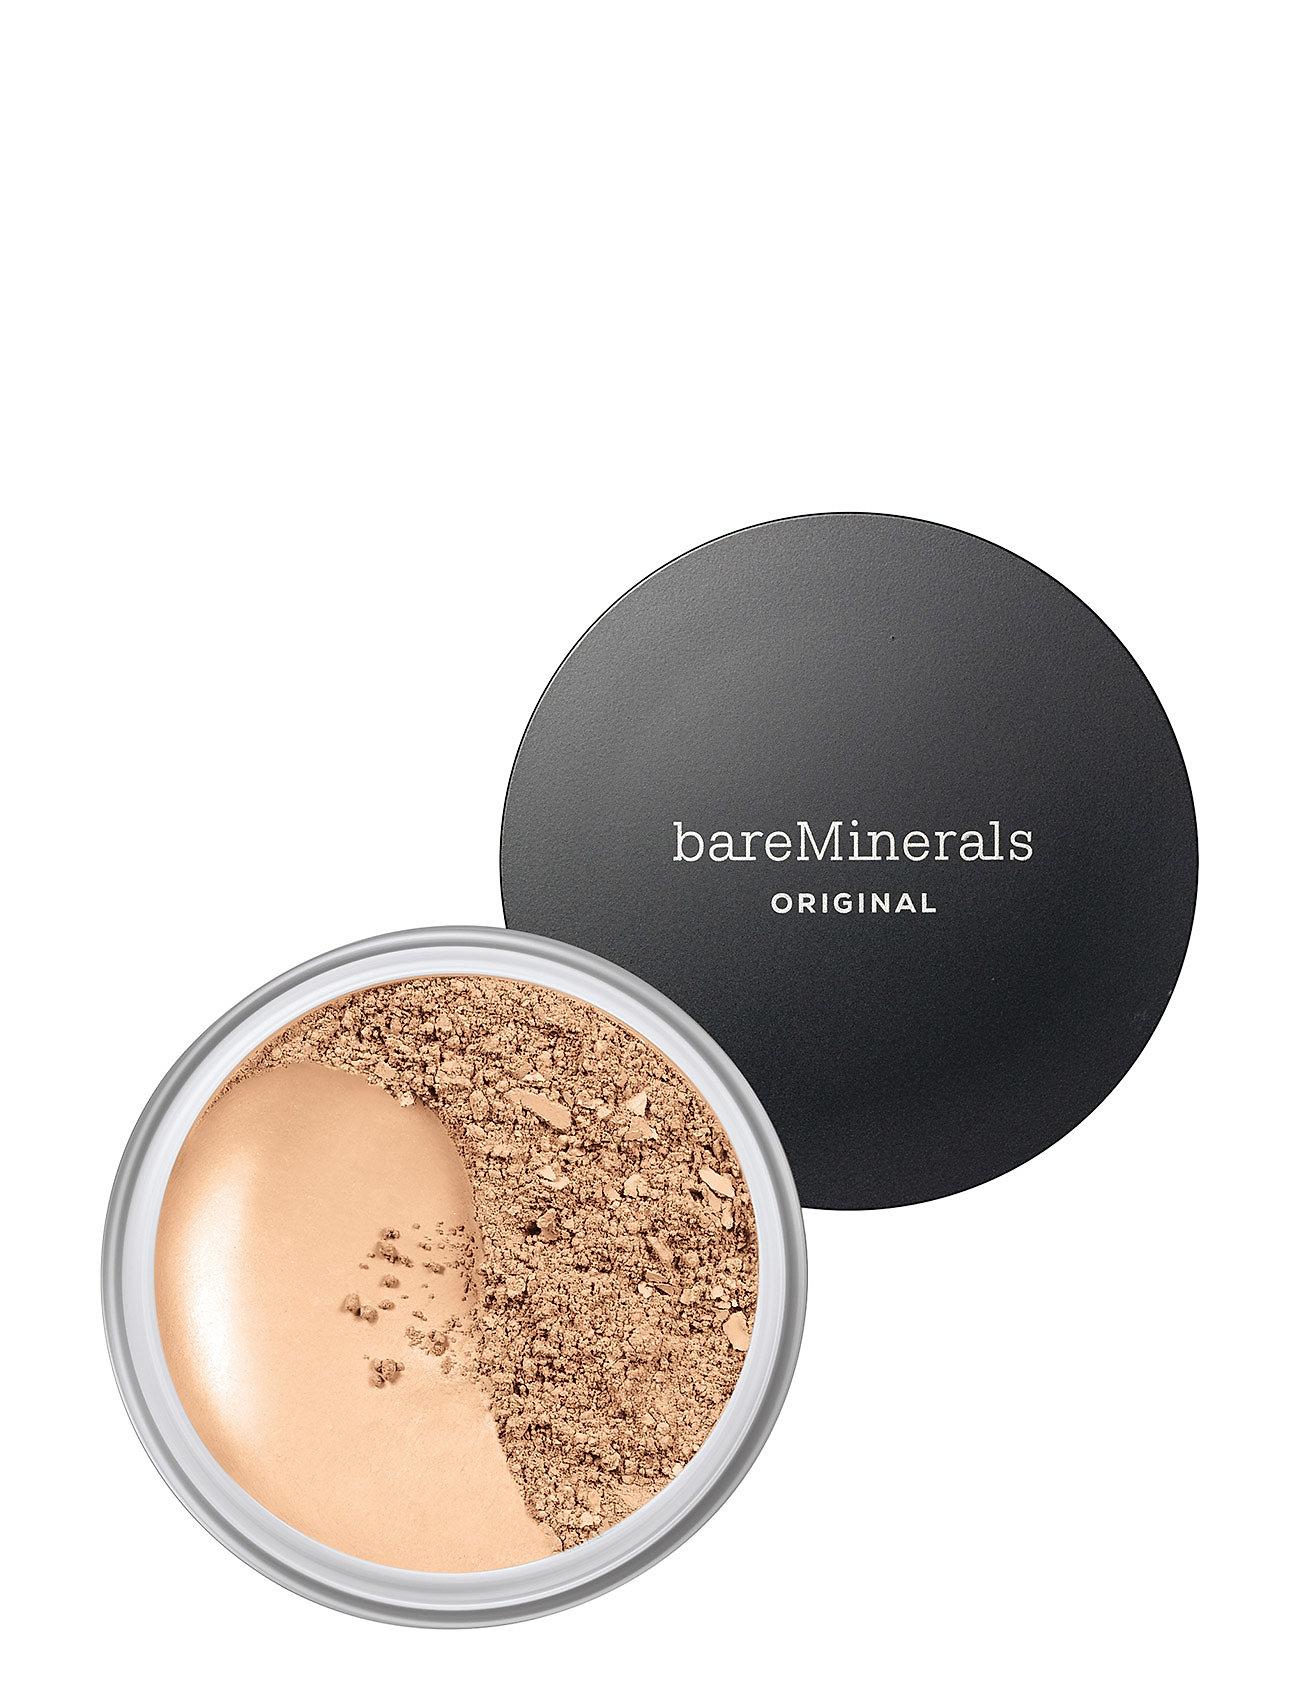 Image of Matte Foundation Spf 15 Foundation Makeup BareMinerals (3308586435)